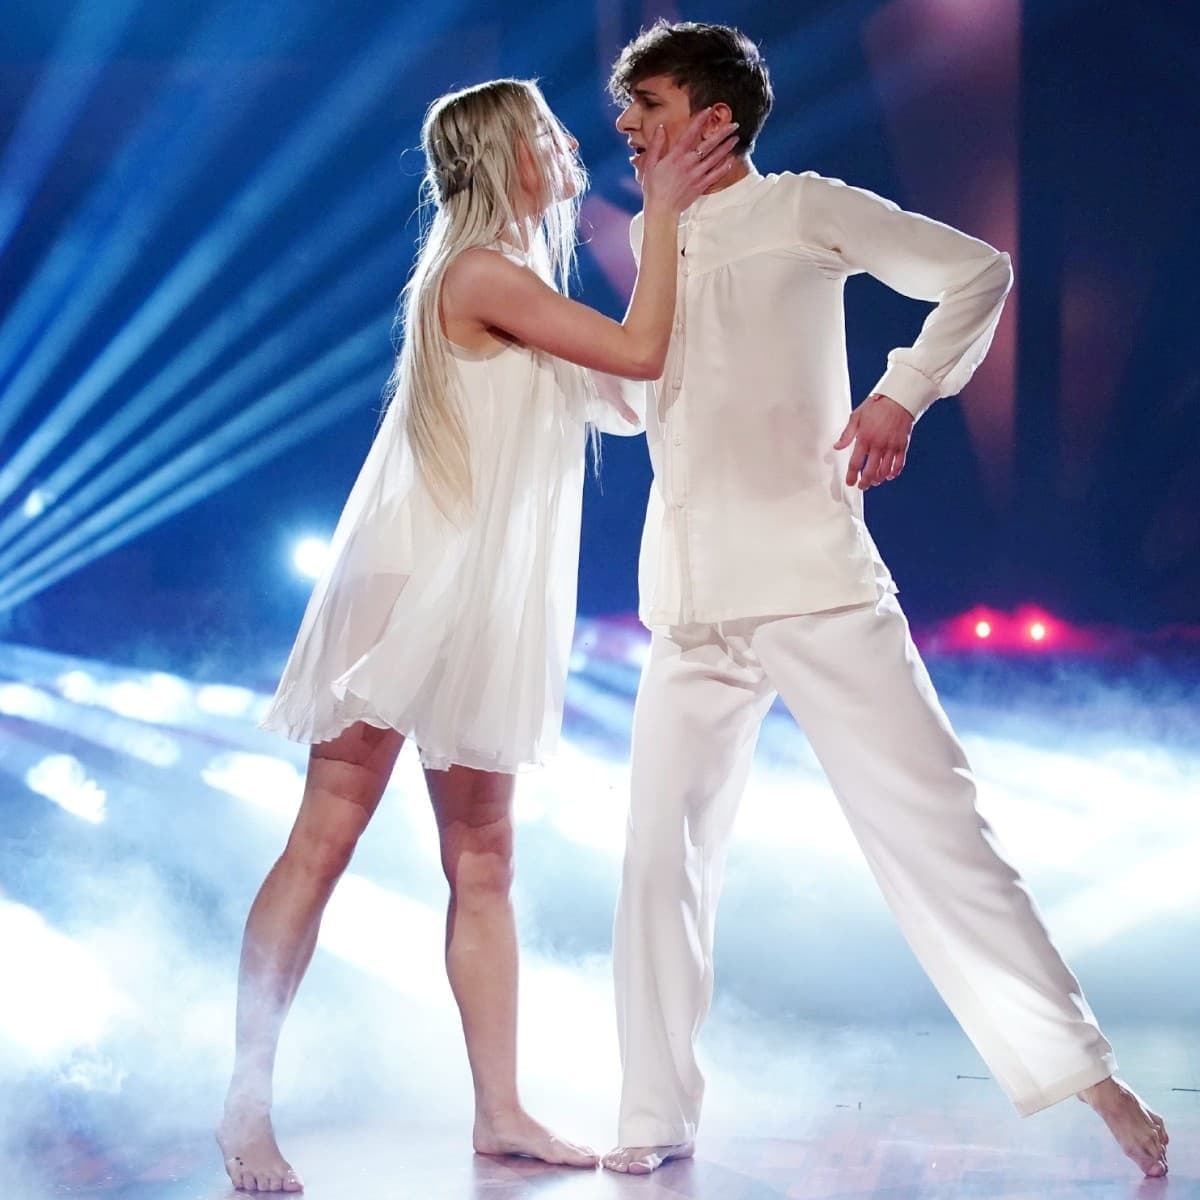 Katja Kalugina - Lukas Rieger bei Let's dance am 29.3.2019